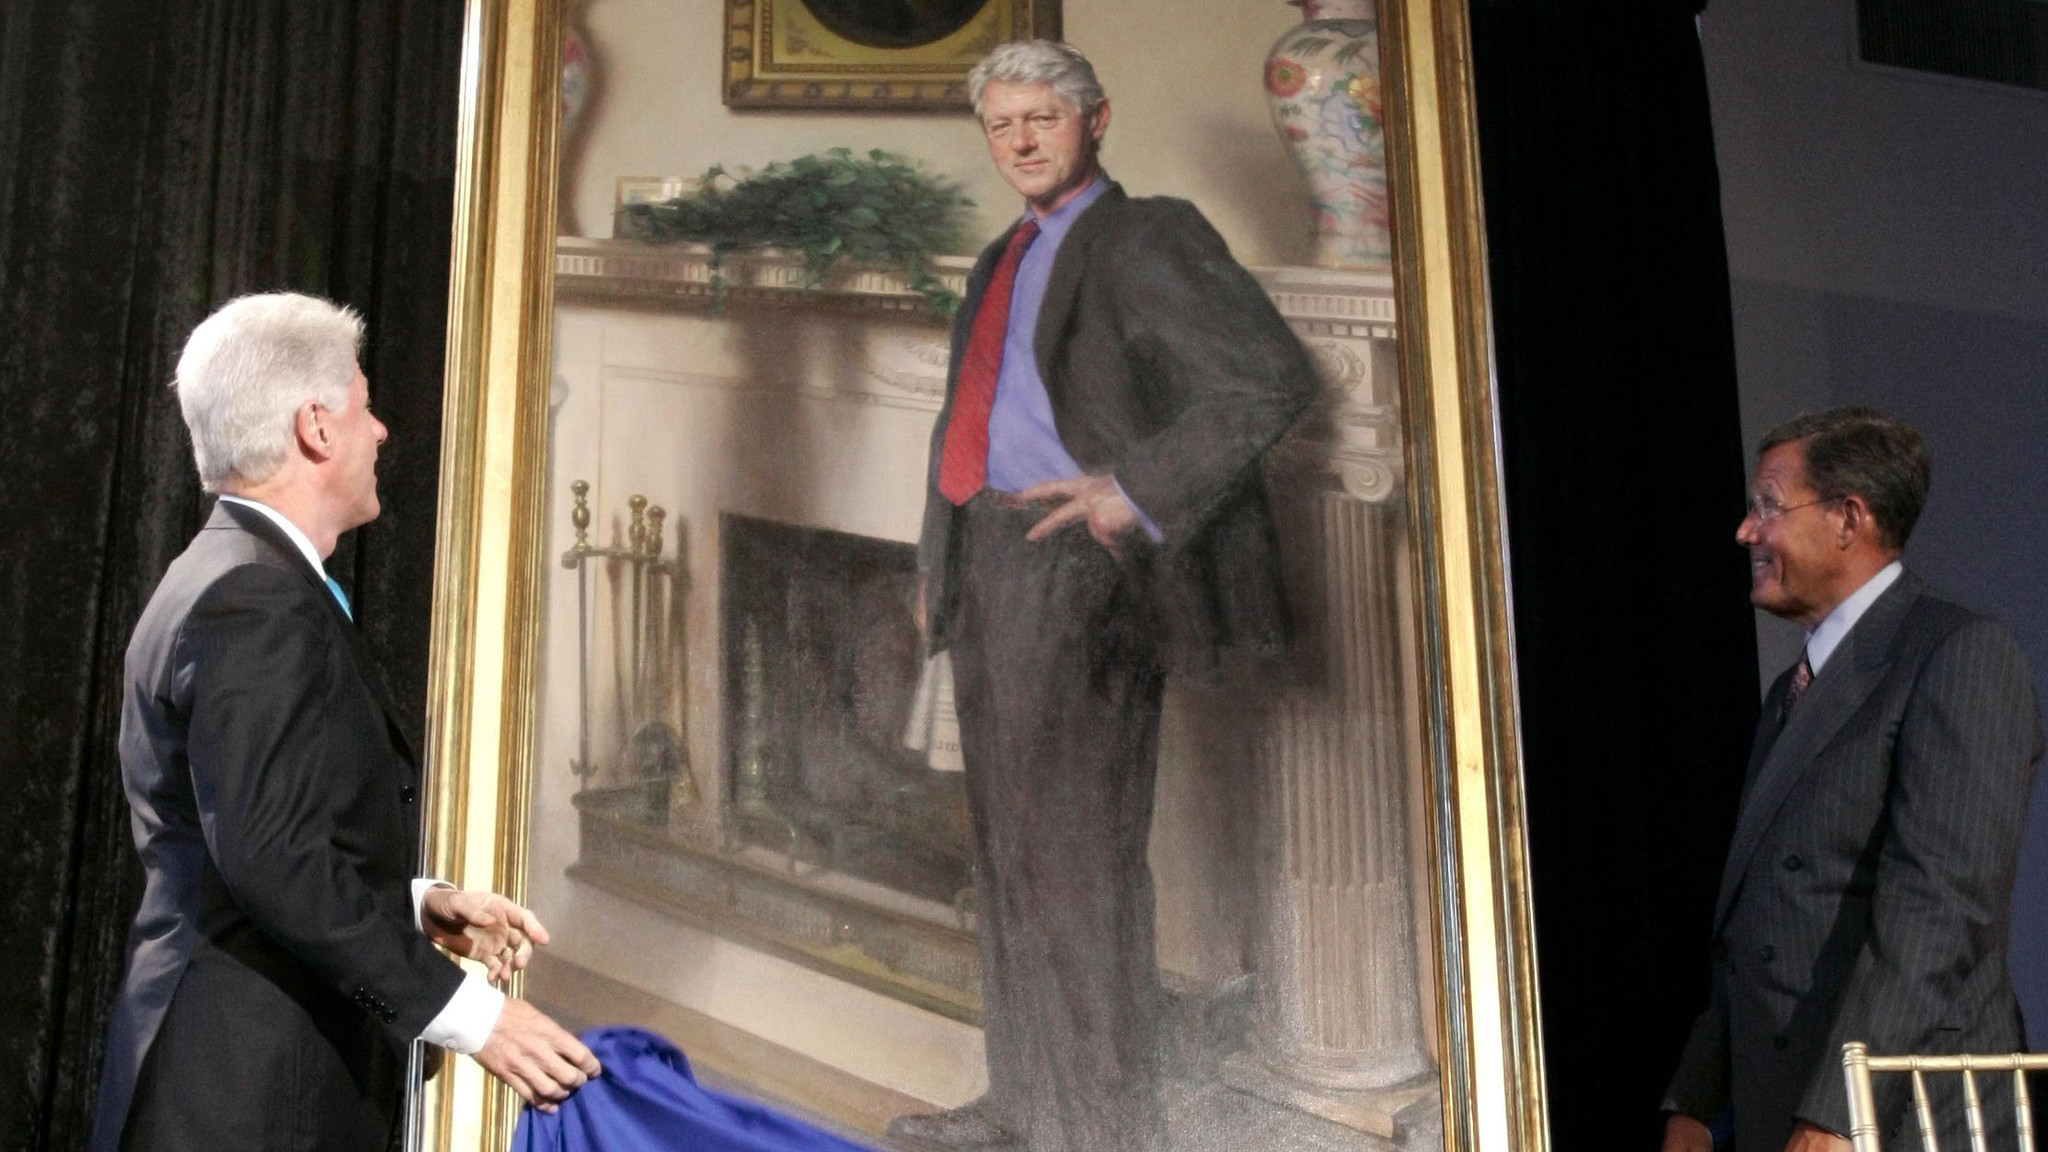 Bill Clinton portrait features shadow of Lewinsky dress ...